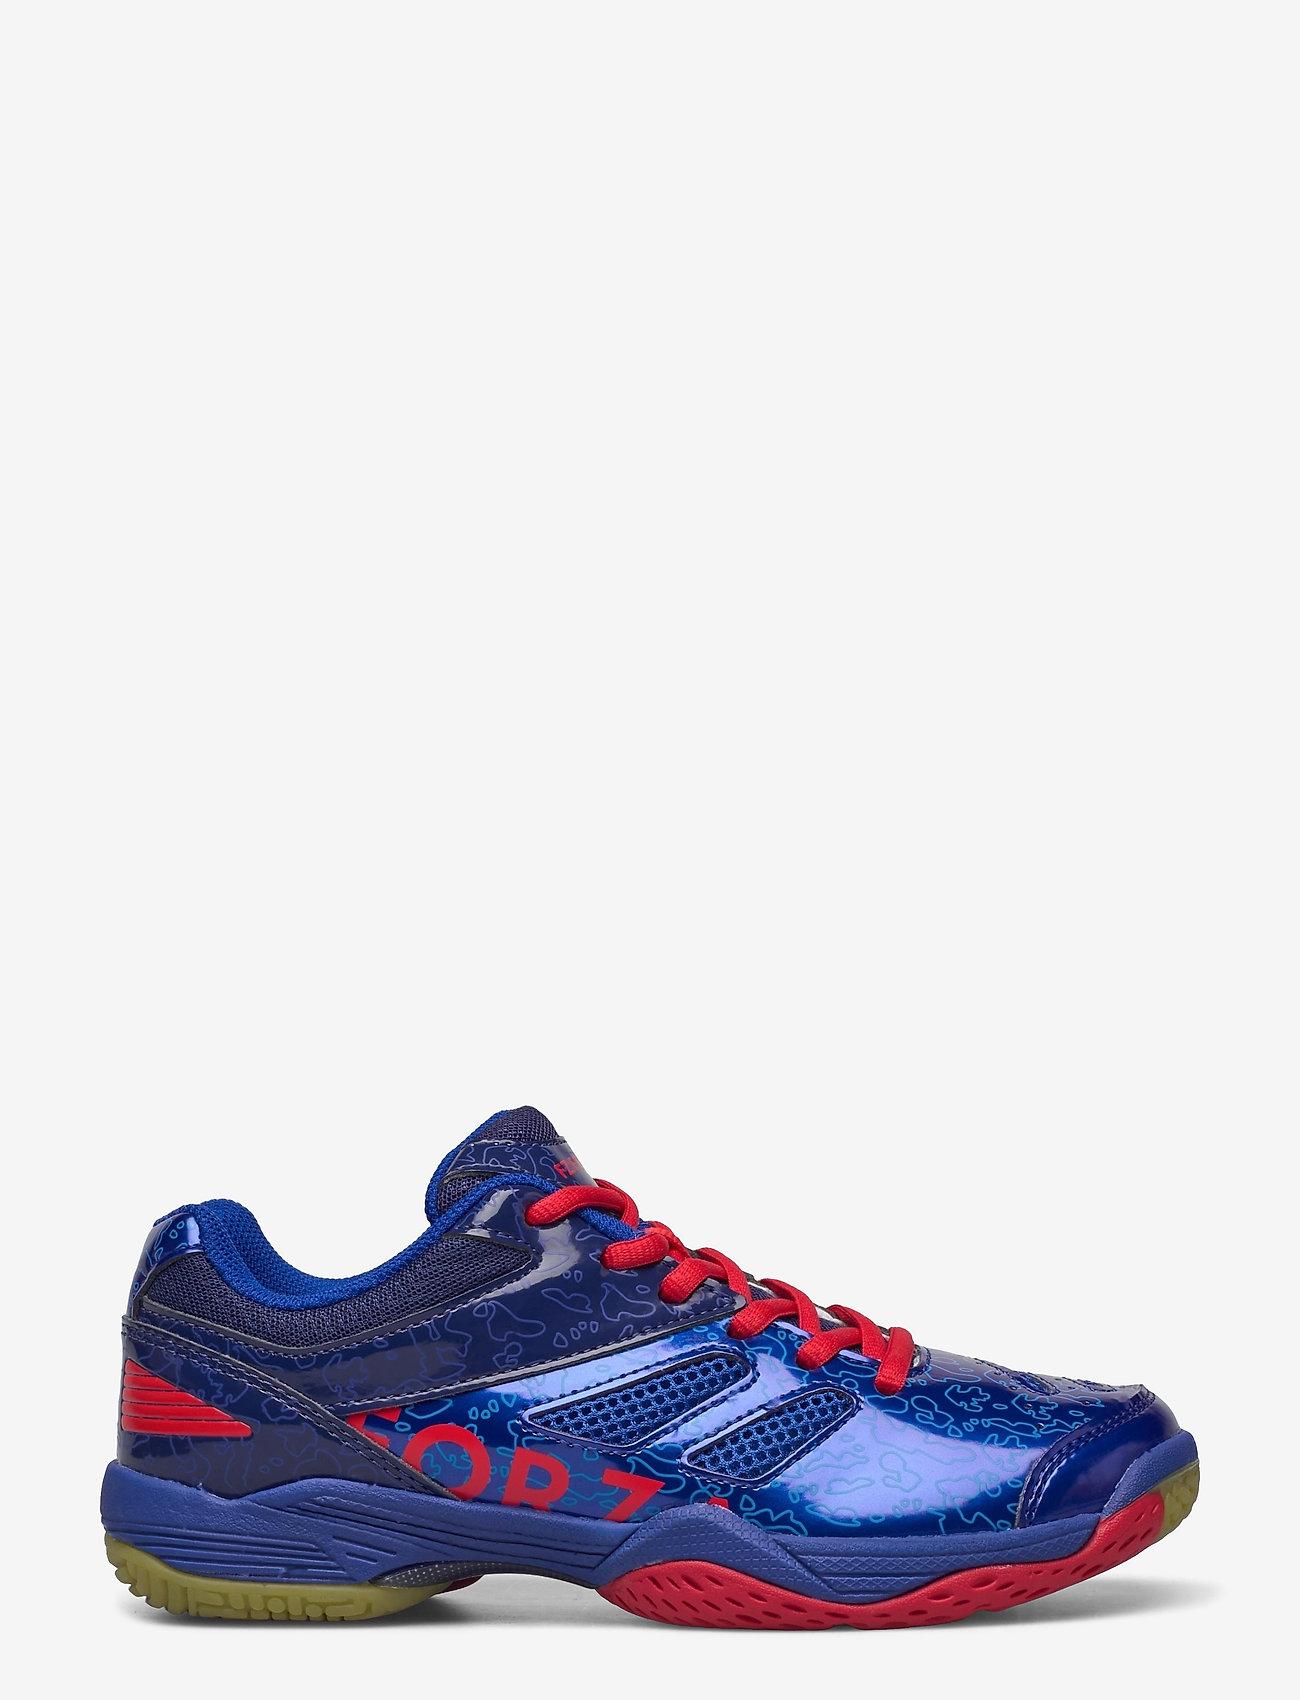 FZ Forza - Court flyer shoes - ketsjersportsko - 01142 electric blue - 0